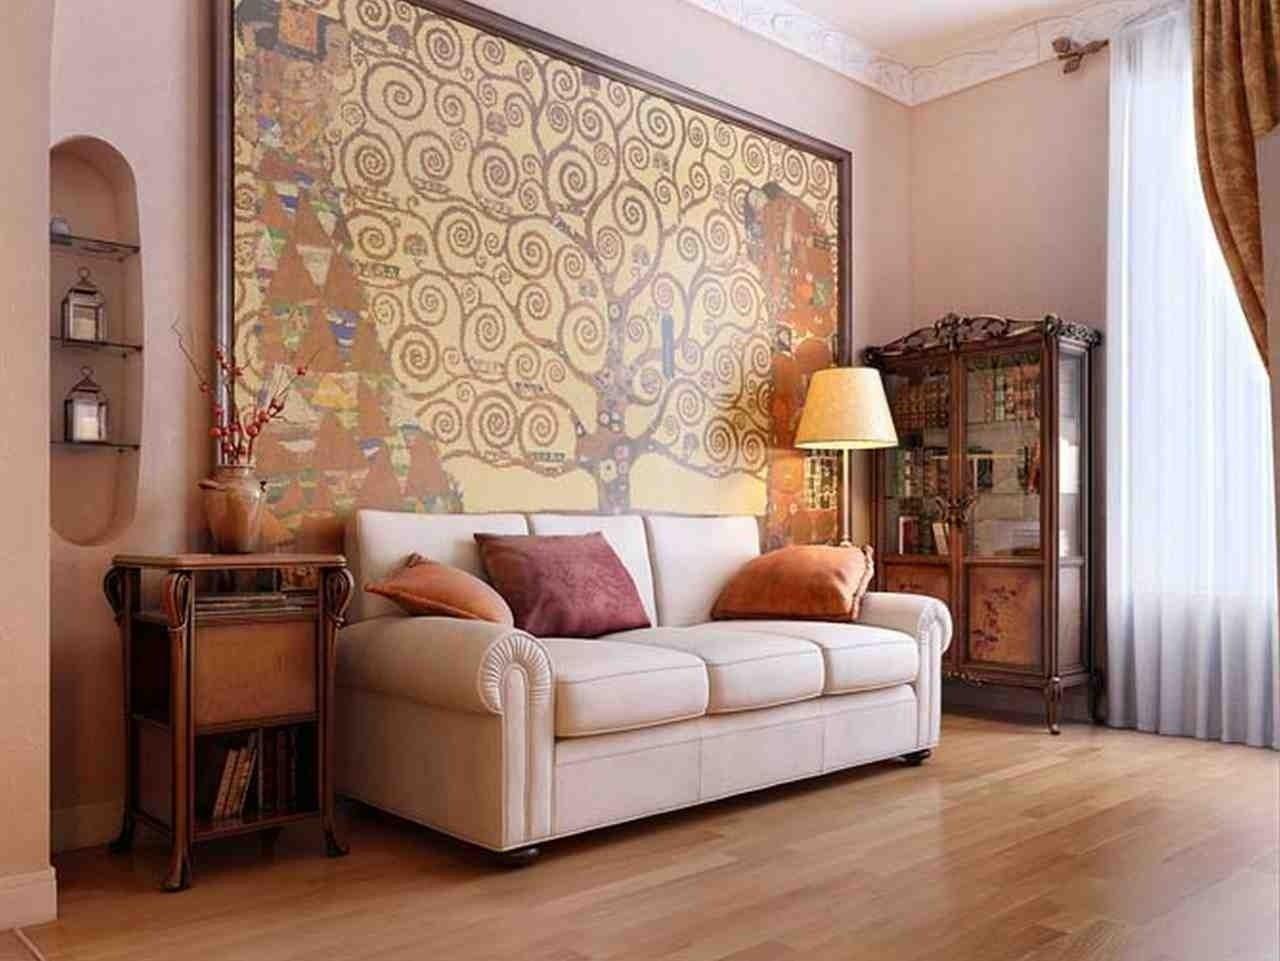 10 Amazing Decorating Ideas For Large Walls decoration ideas for large walls e280a2 walls decor 2020